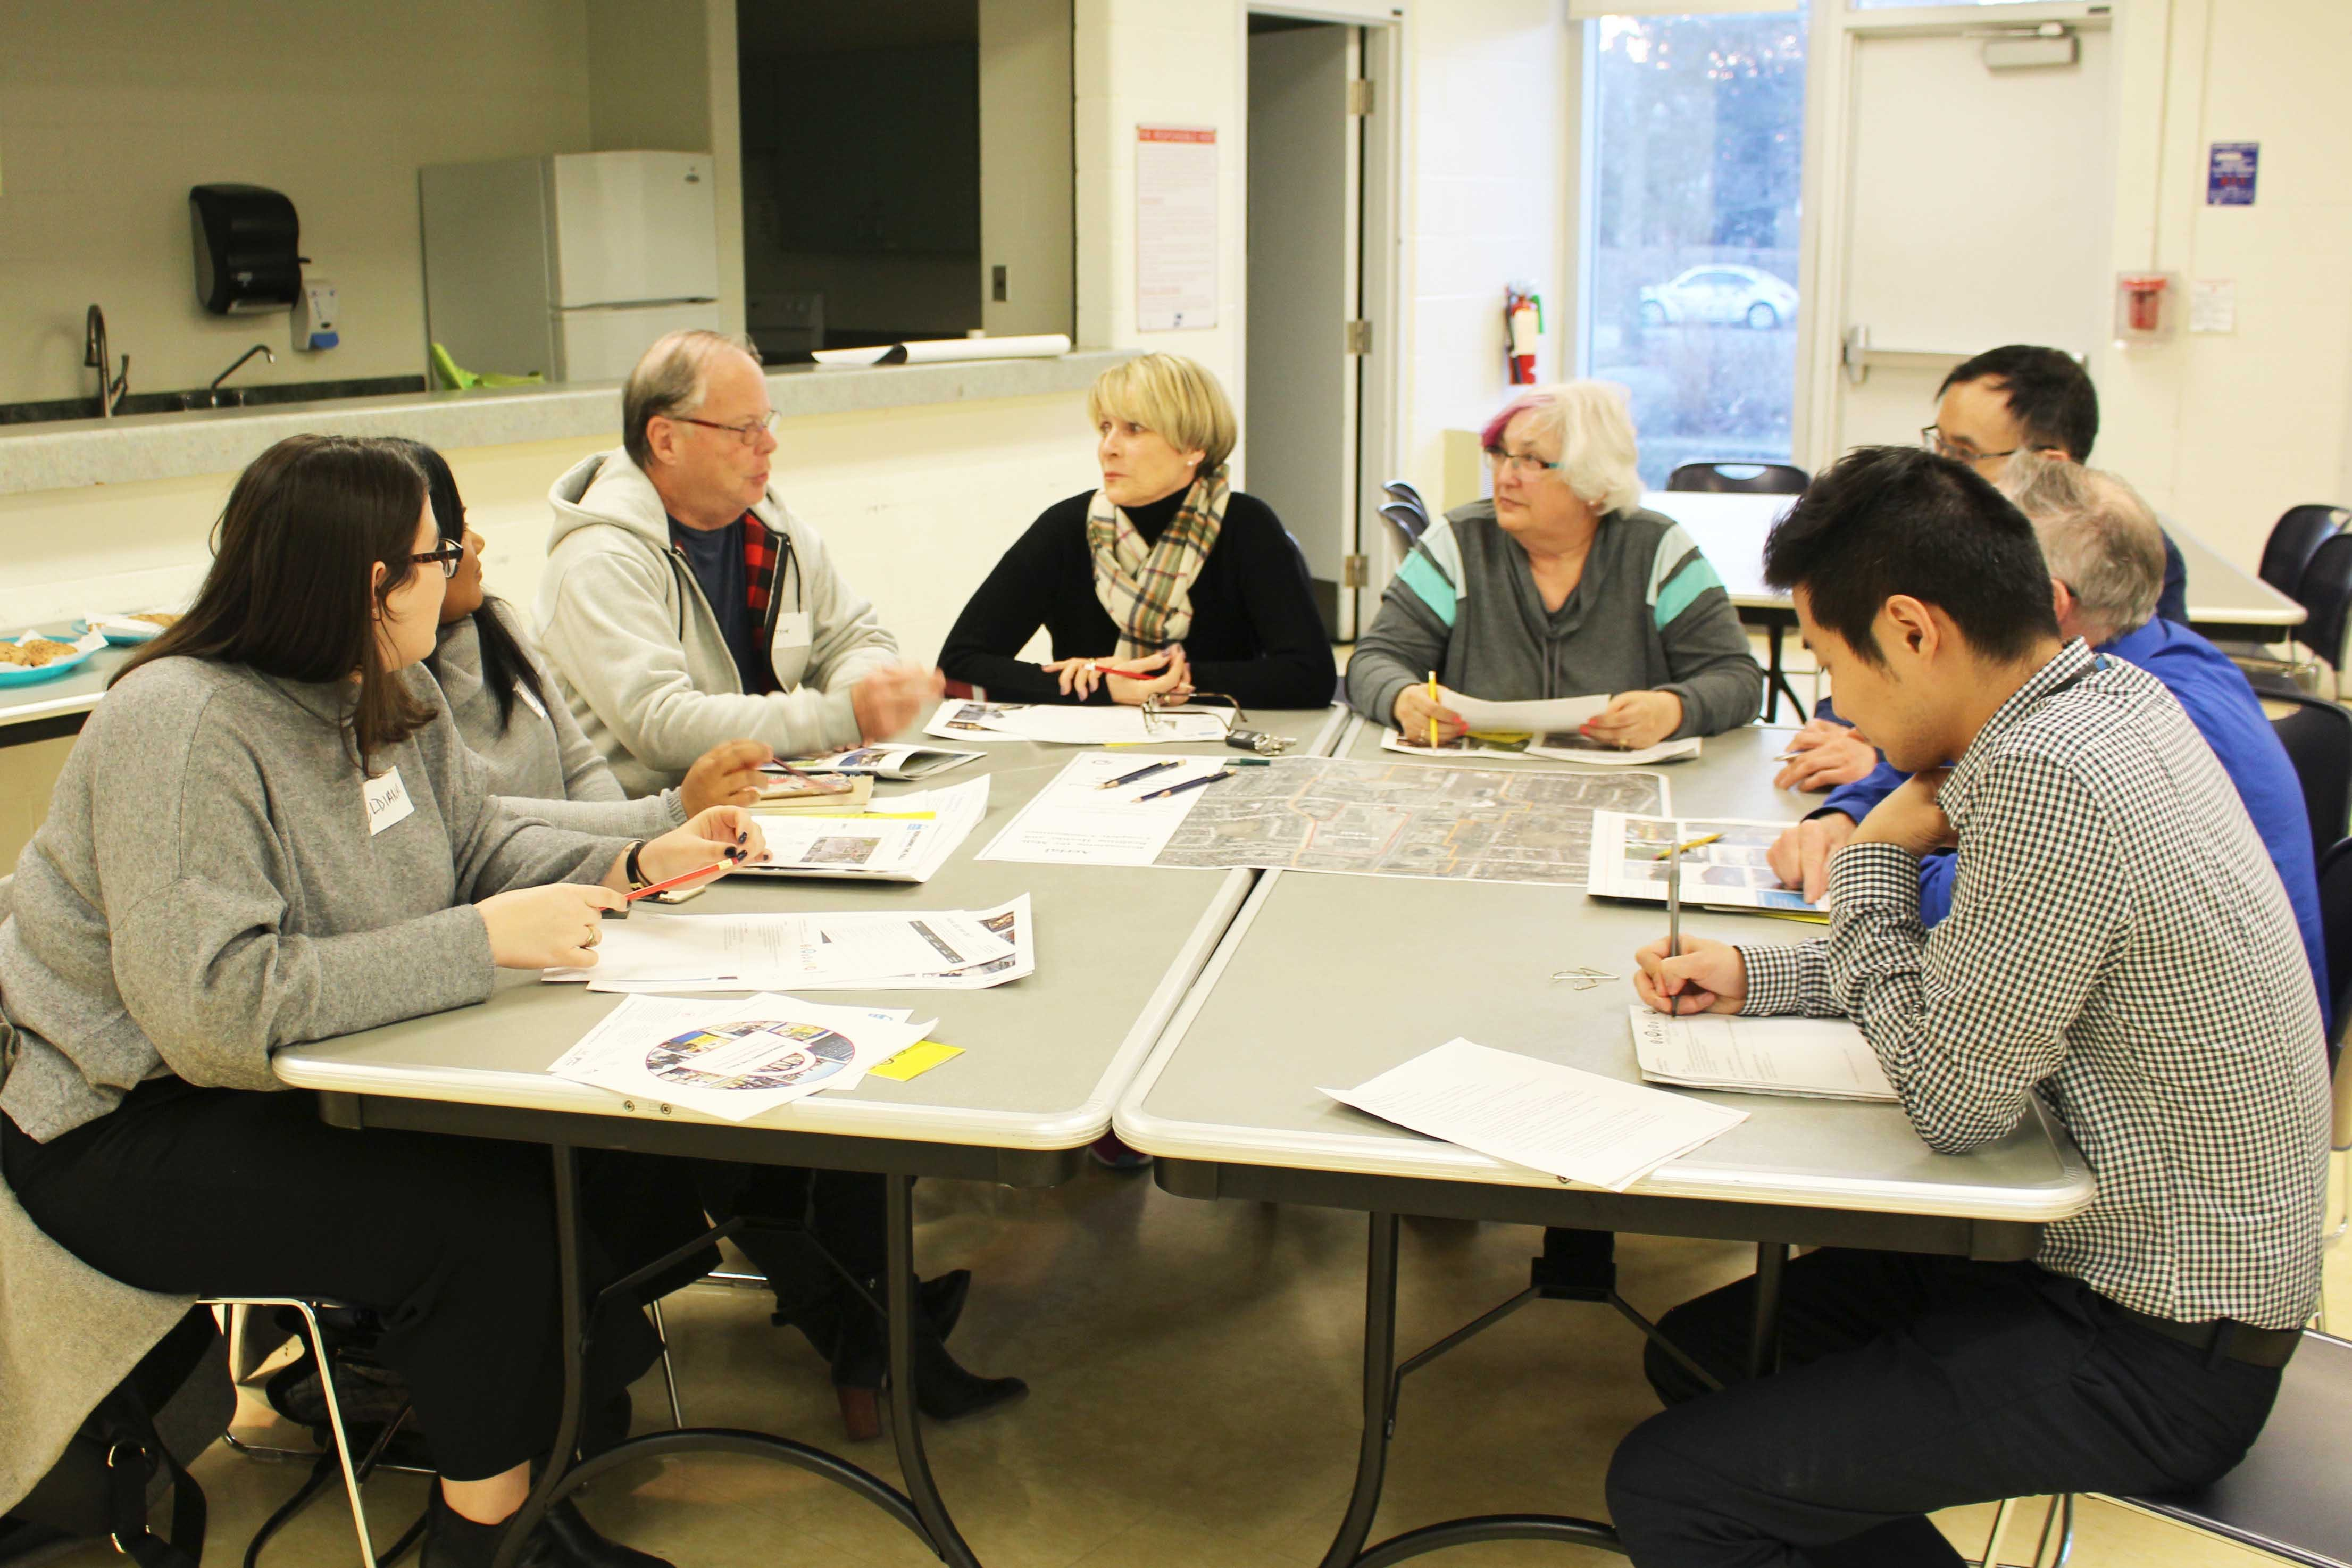 Rathwood-Applewood Community Meeting